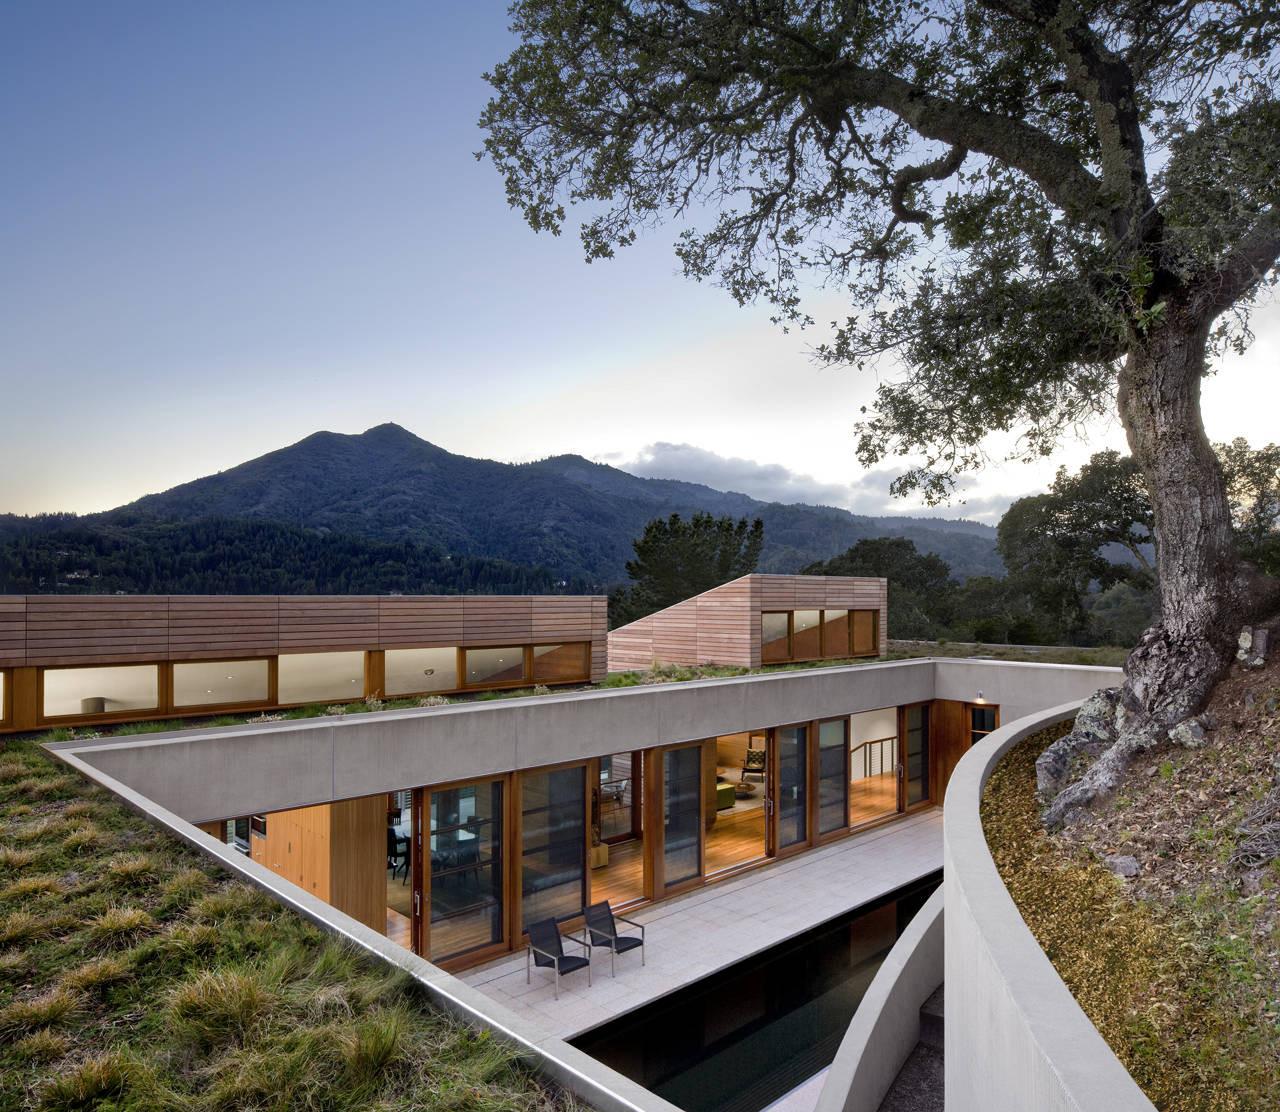 hillside architecture